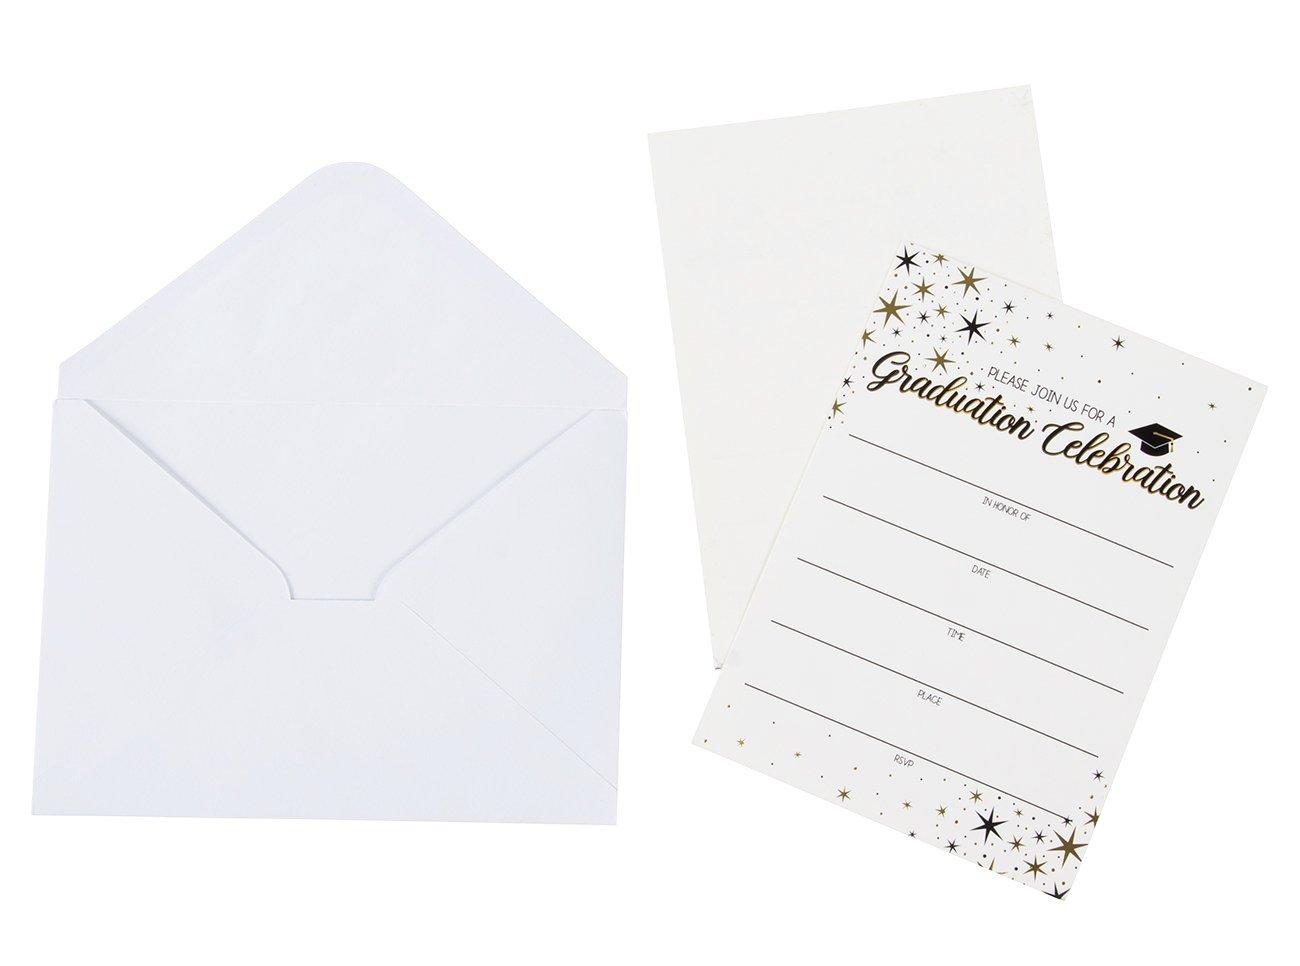 60-Pack Graduation Party Invitations - Graduation Invitations Cards, Graduation Ceremony Announcement Cards, 2018 Graduation Party Favors, Envelopes Included, White, 5 x 7 Inches